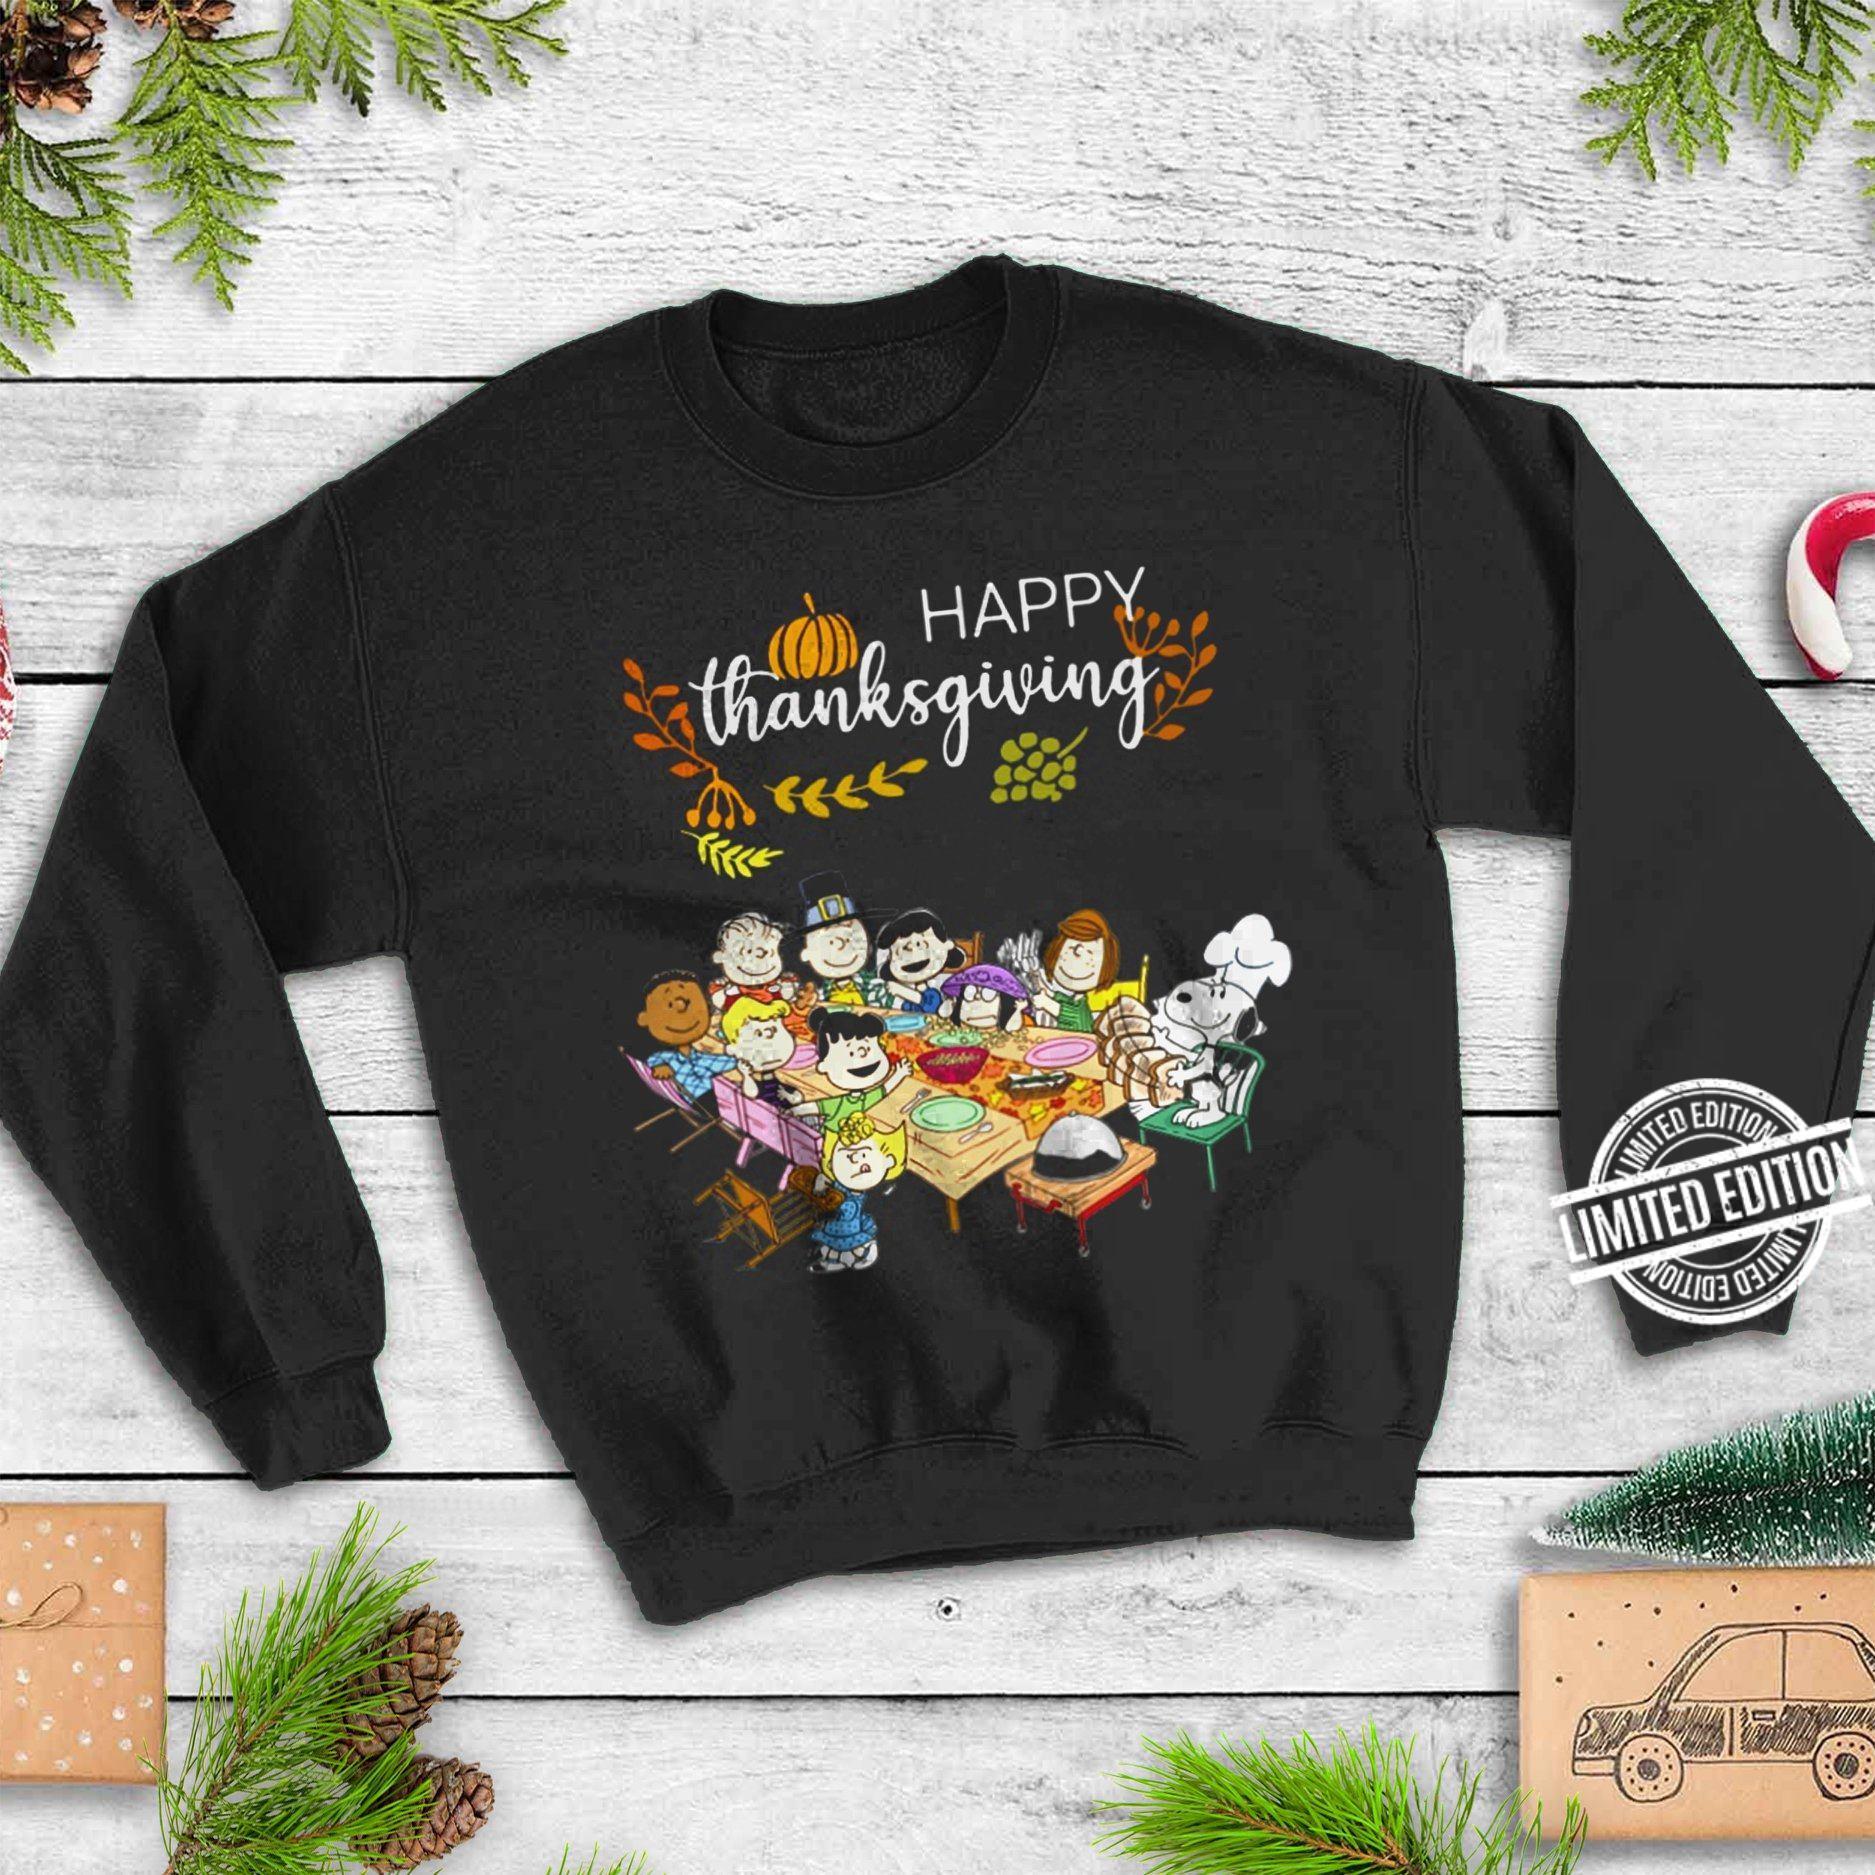 Happy Thnksgiving Snoopy Women T-Shirt